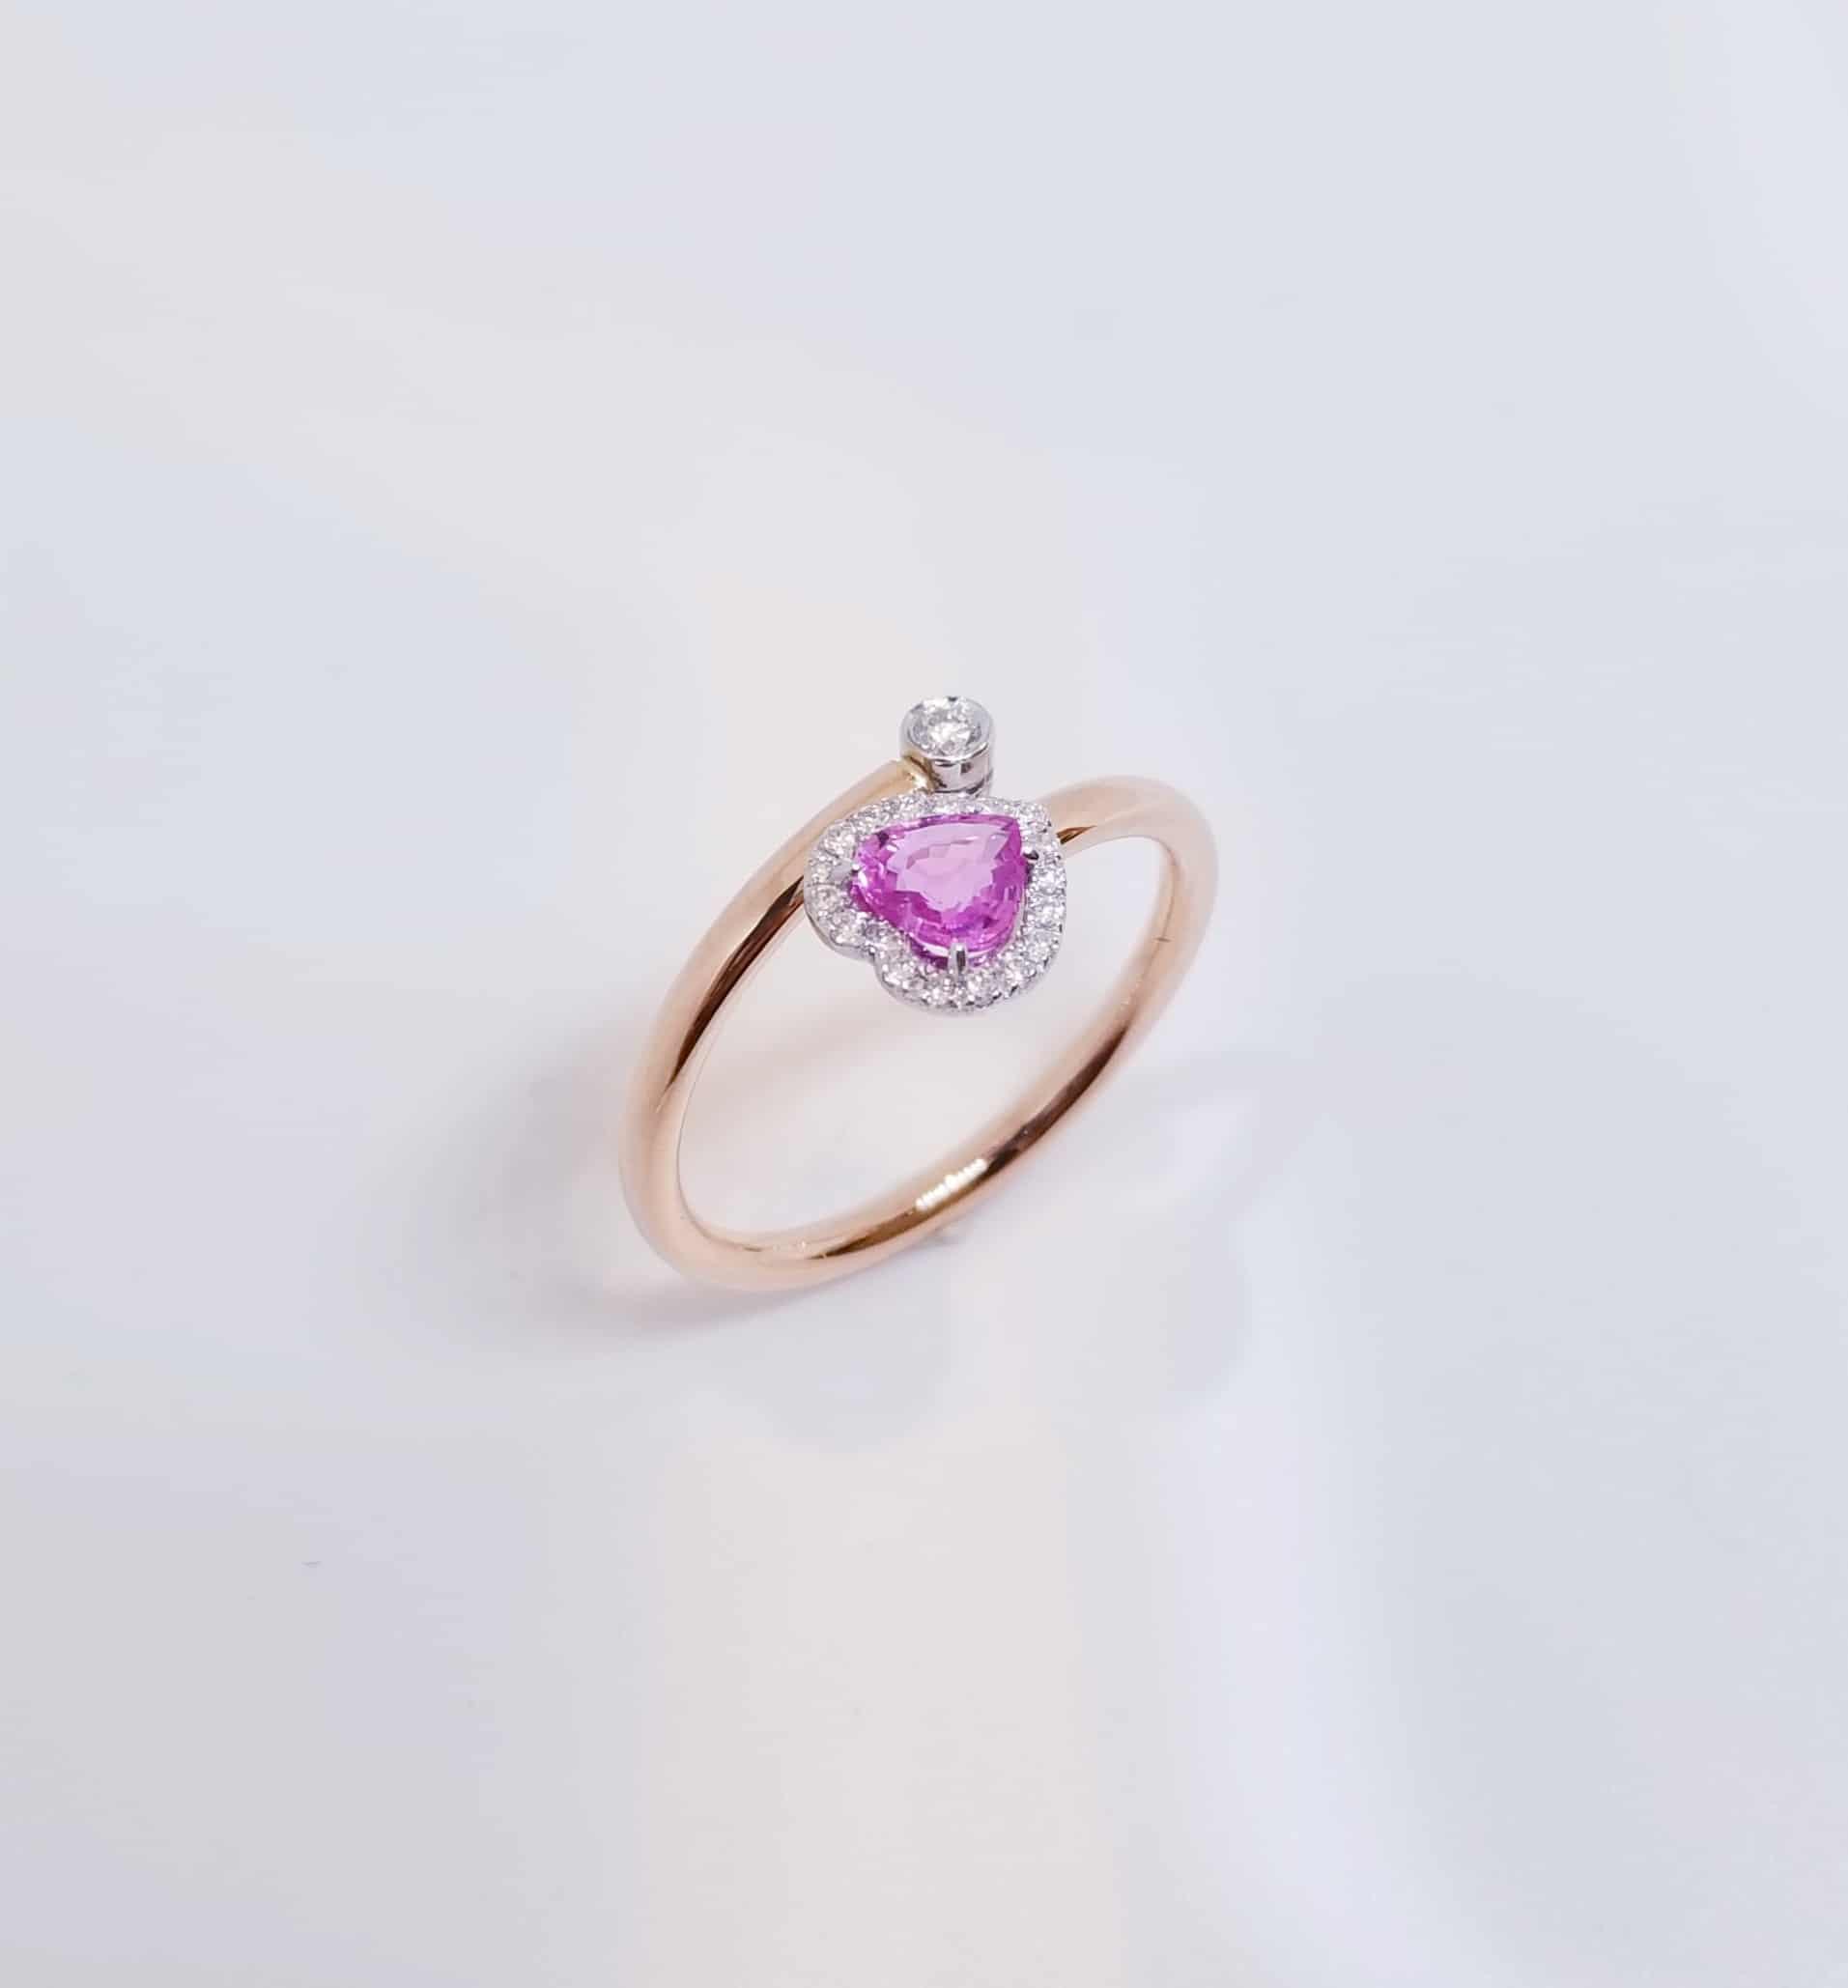 18K金屬心形粉紅藍寶石鑽石戒指